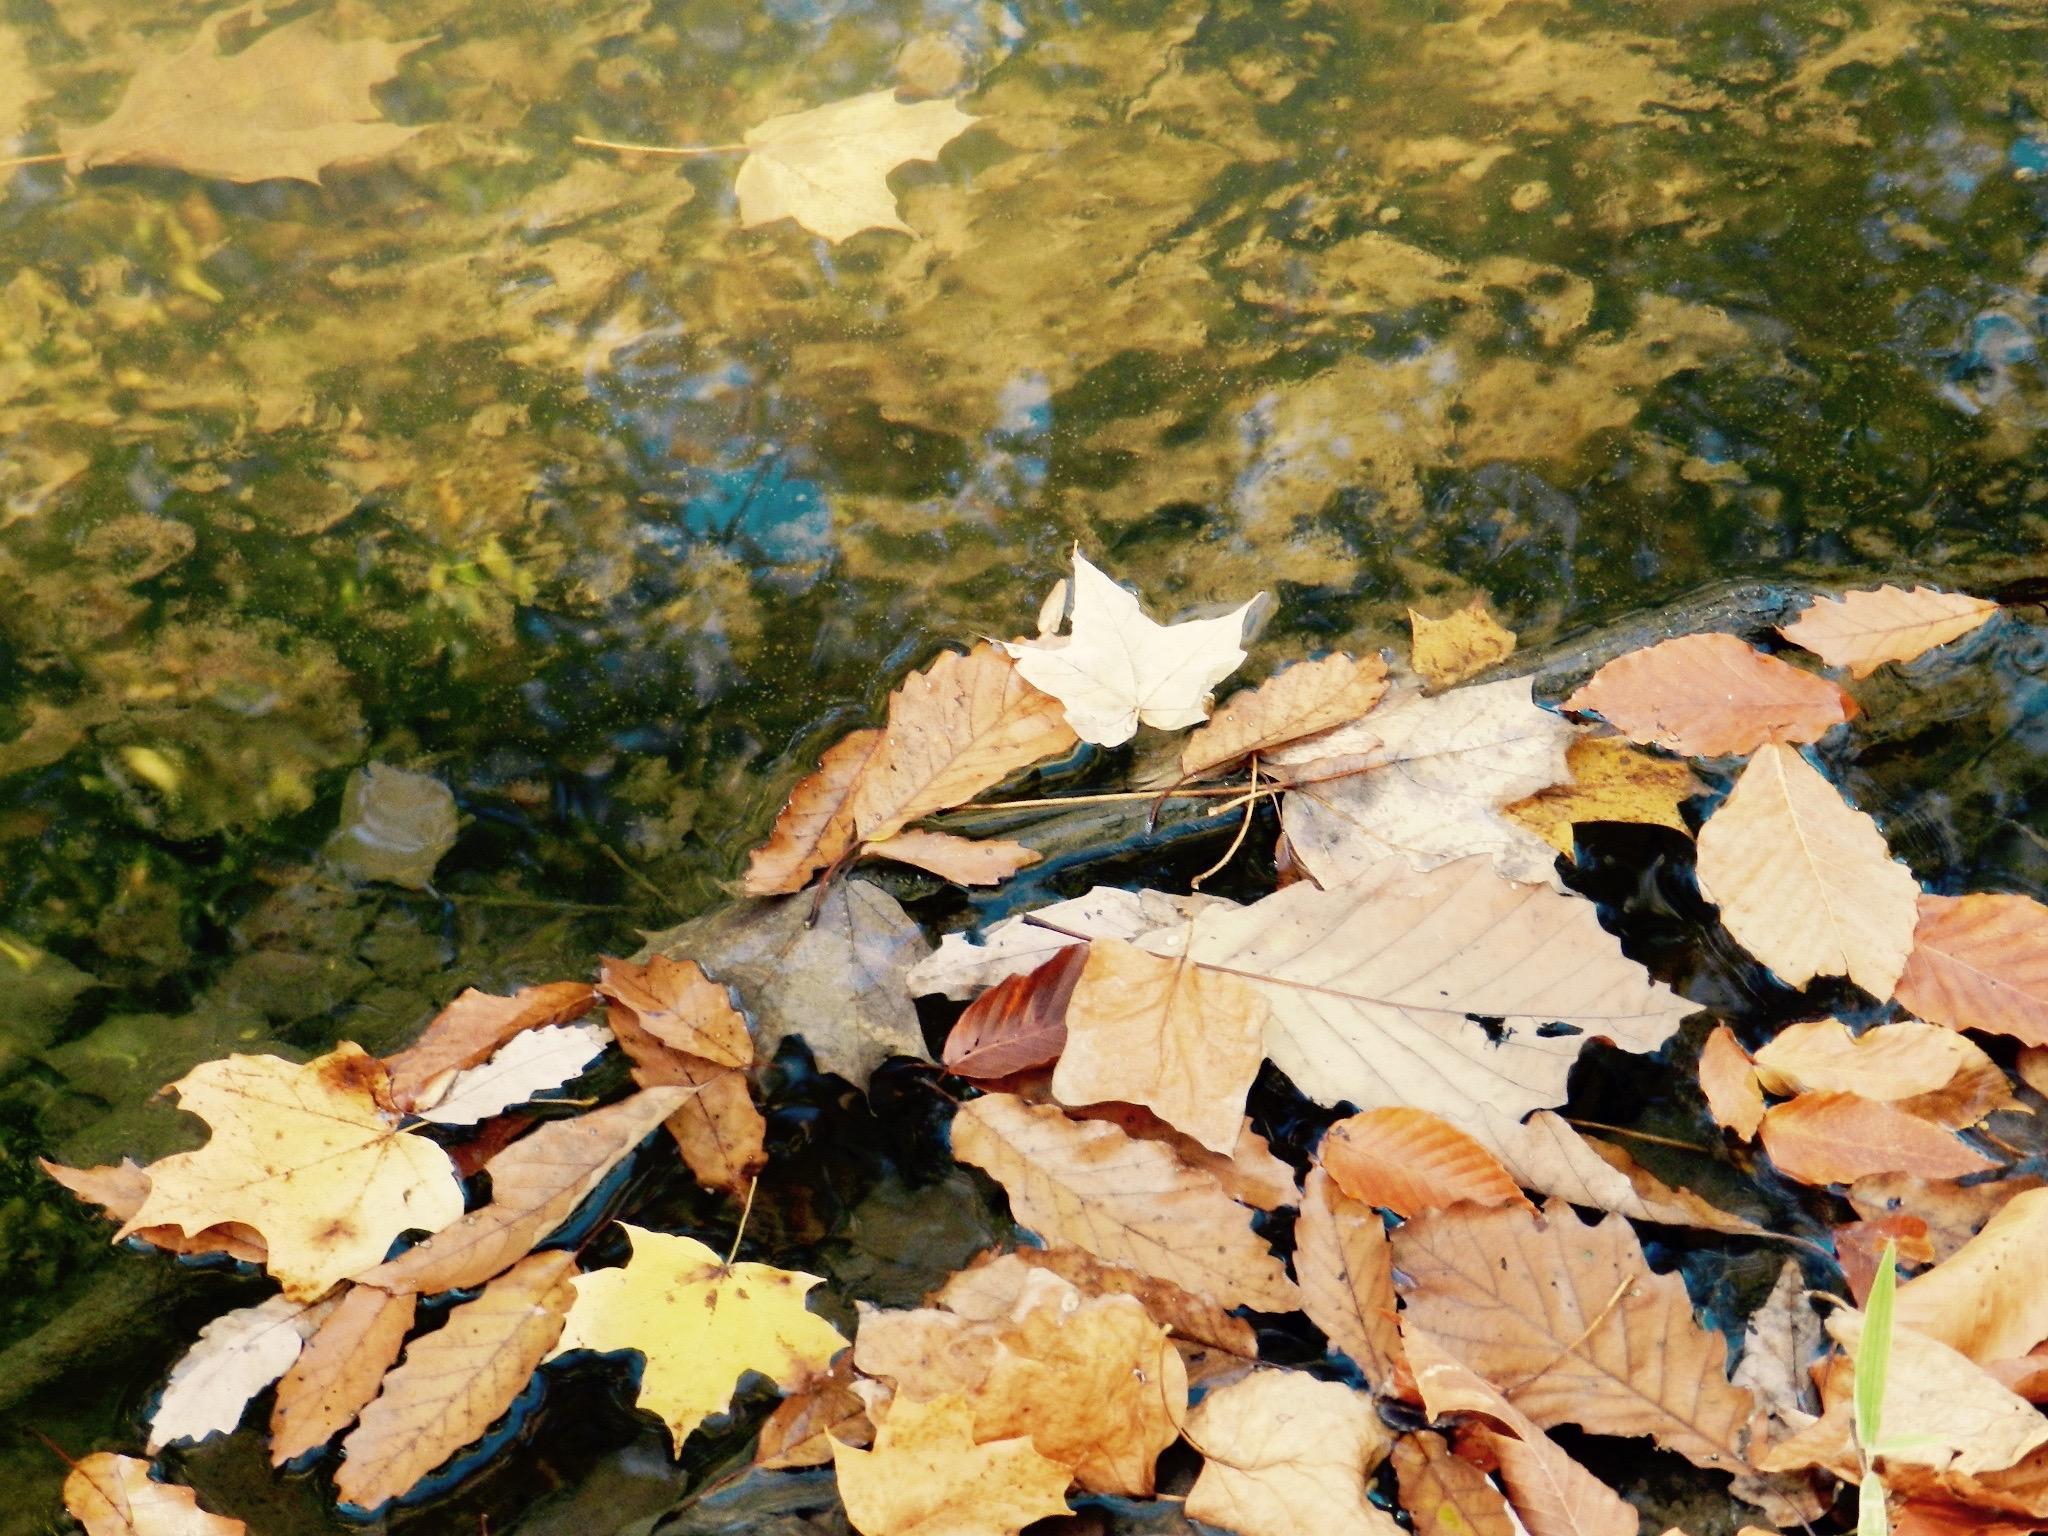 Banked leaves, © 2015 Susan Barsy